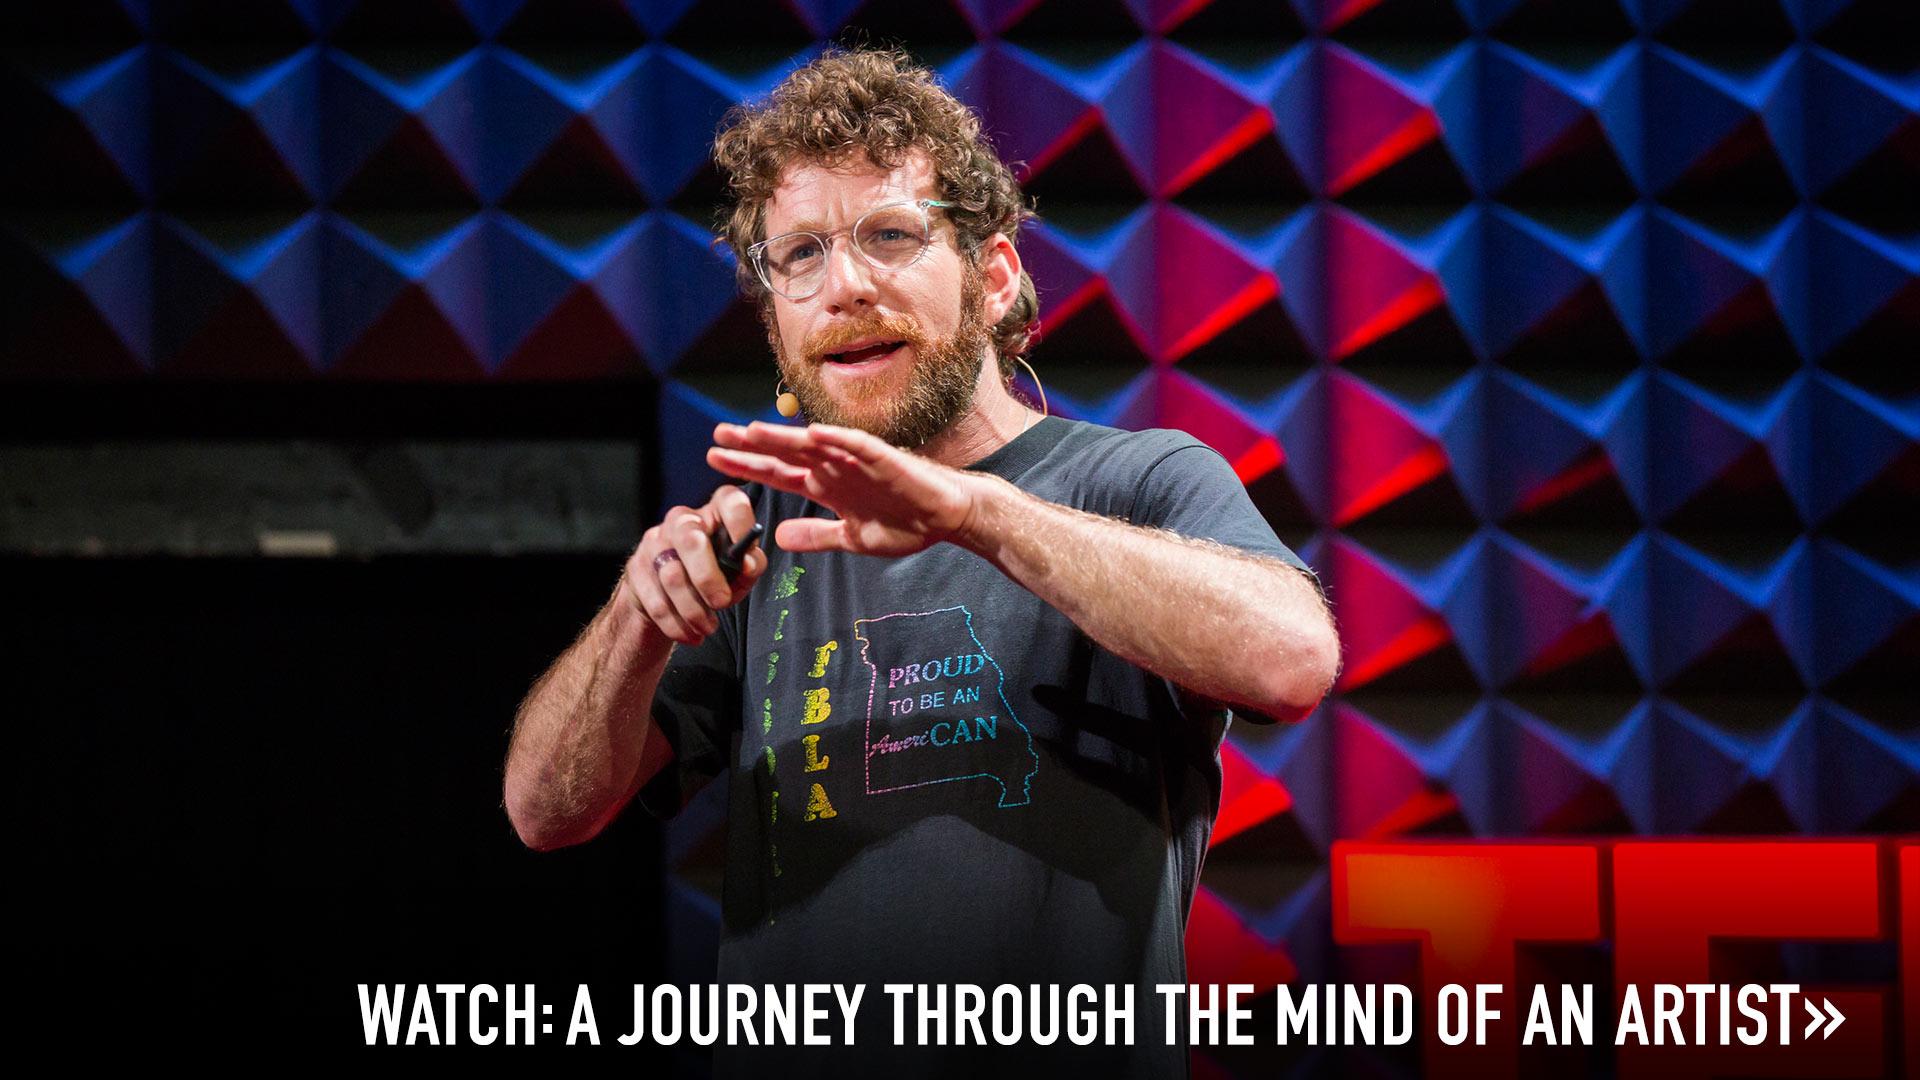 Dustin Yellin A journey through the mind of an artist